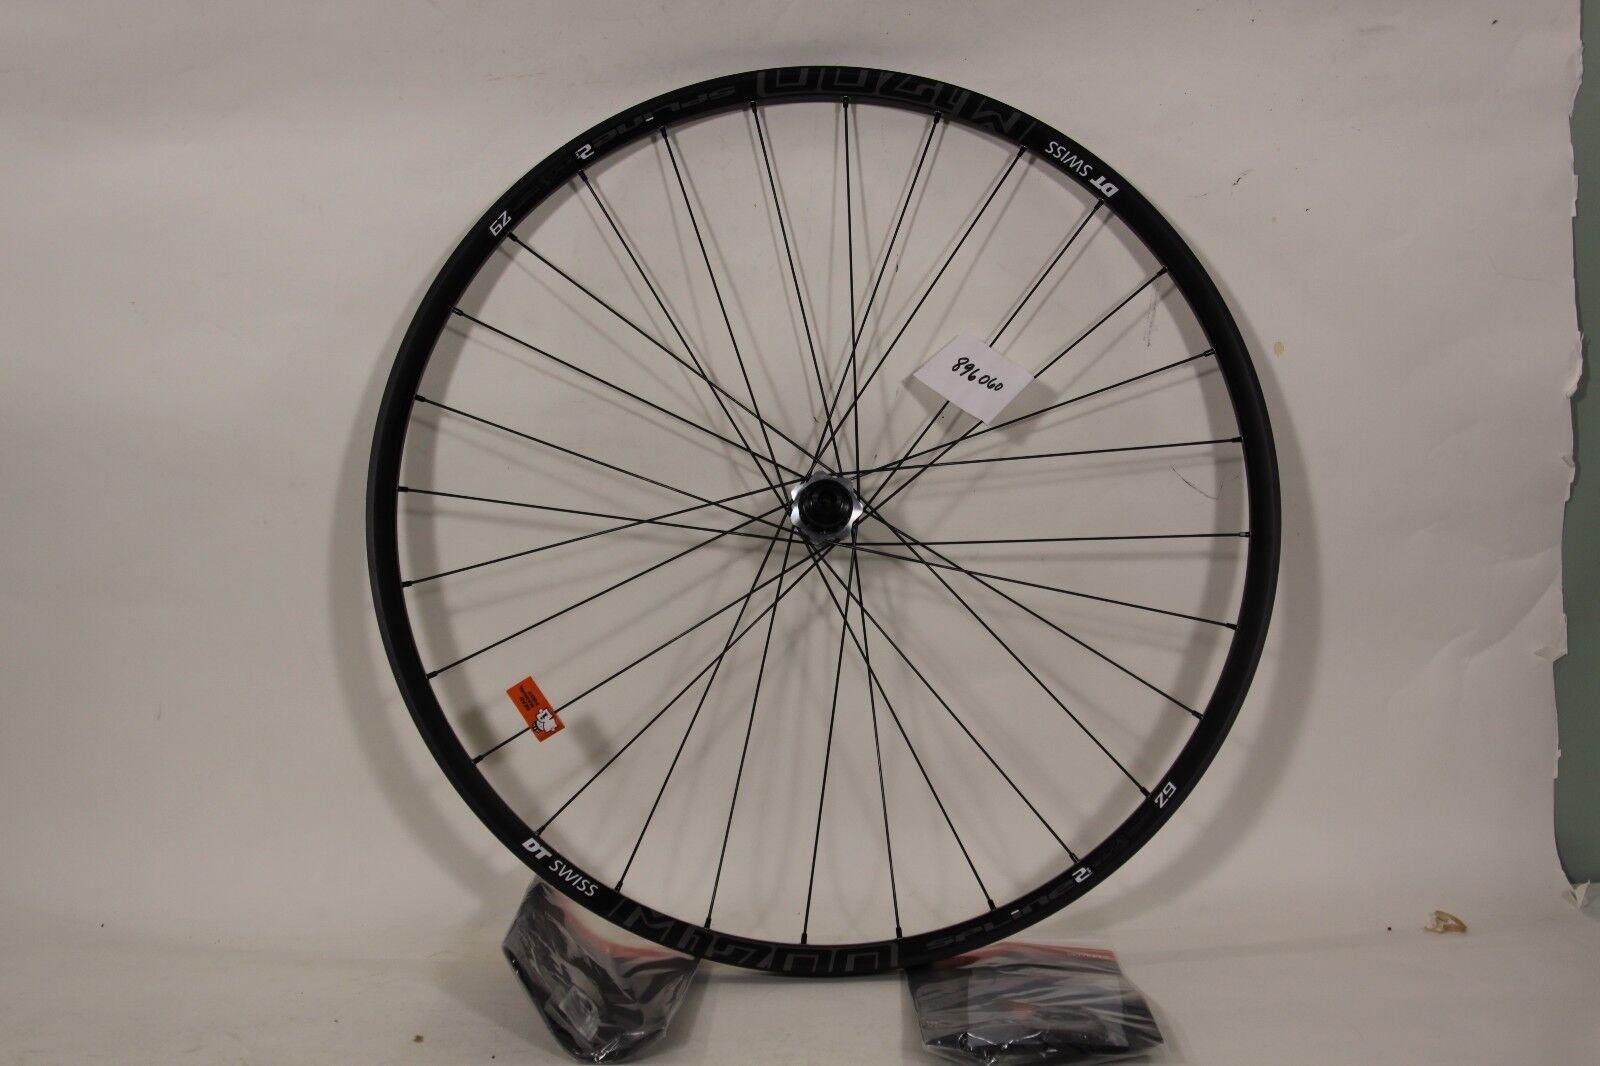 DT Swiss 29  Rear Wheel M1700 Spline2 11 spd XD Driver 12 x 148 Axle 28h 896060